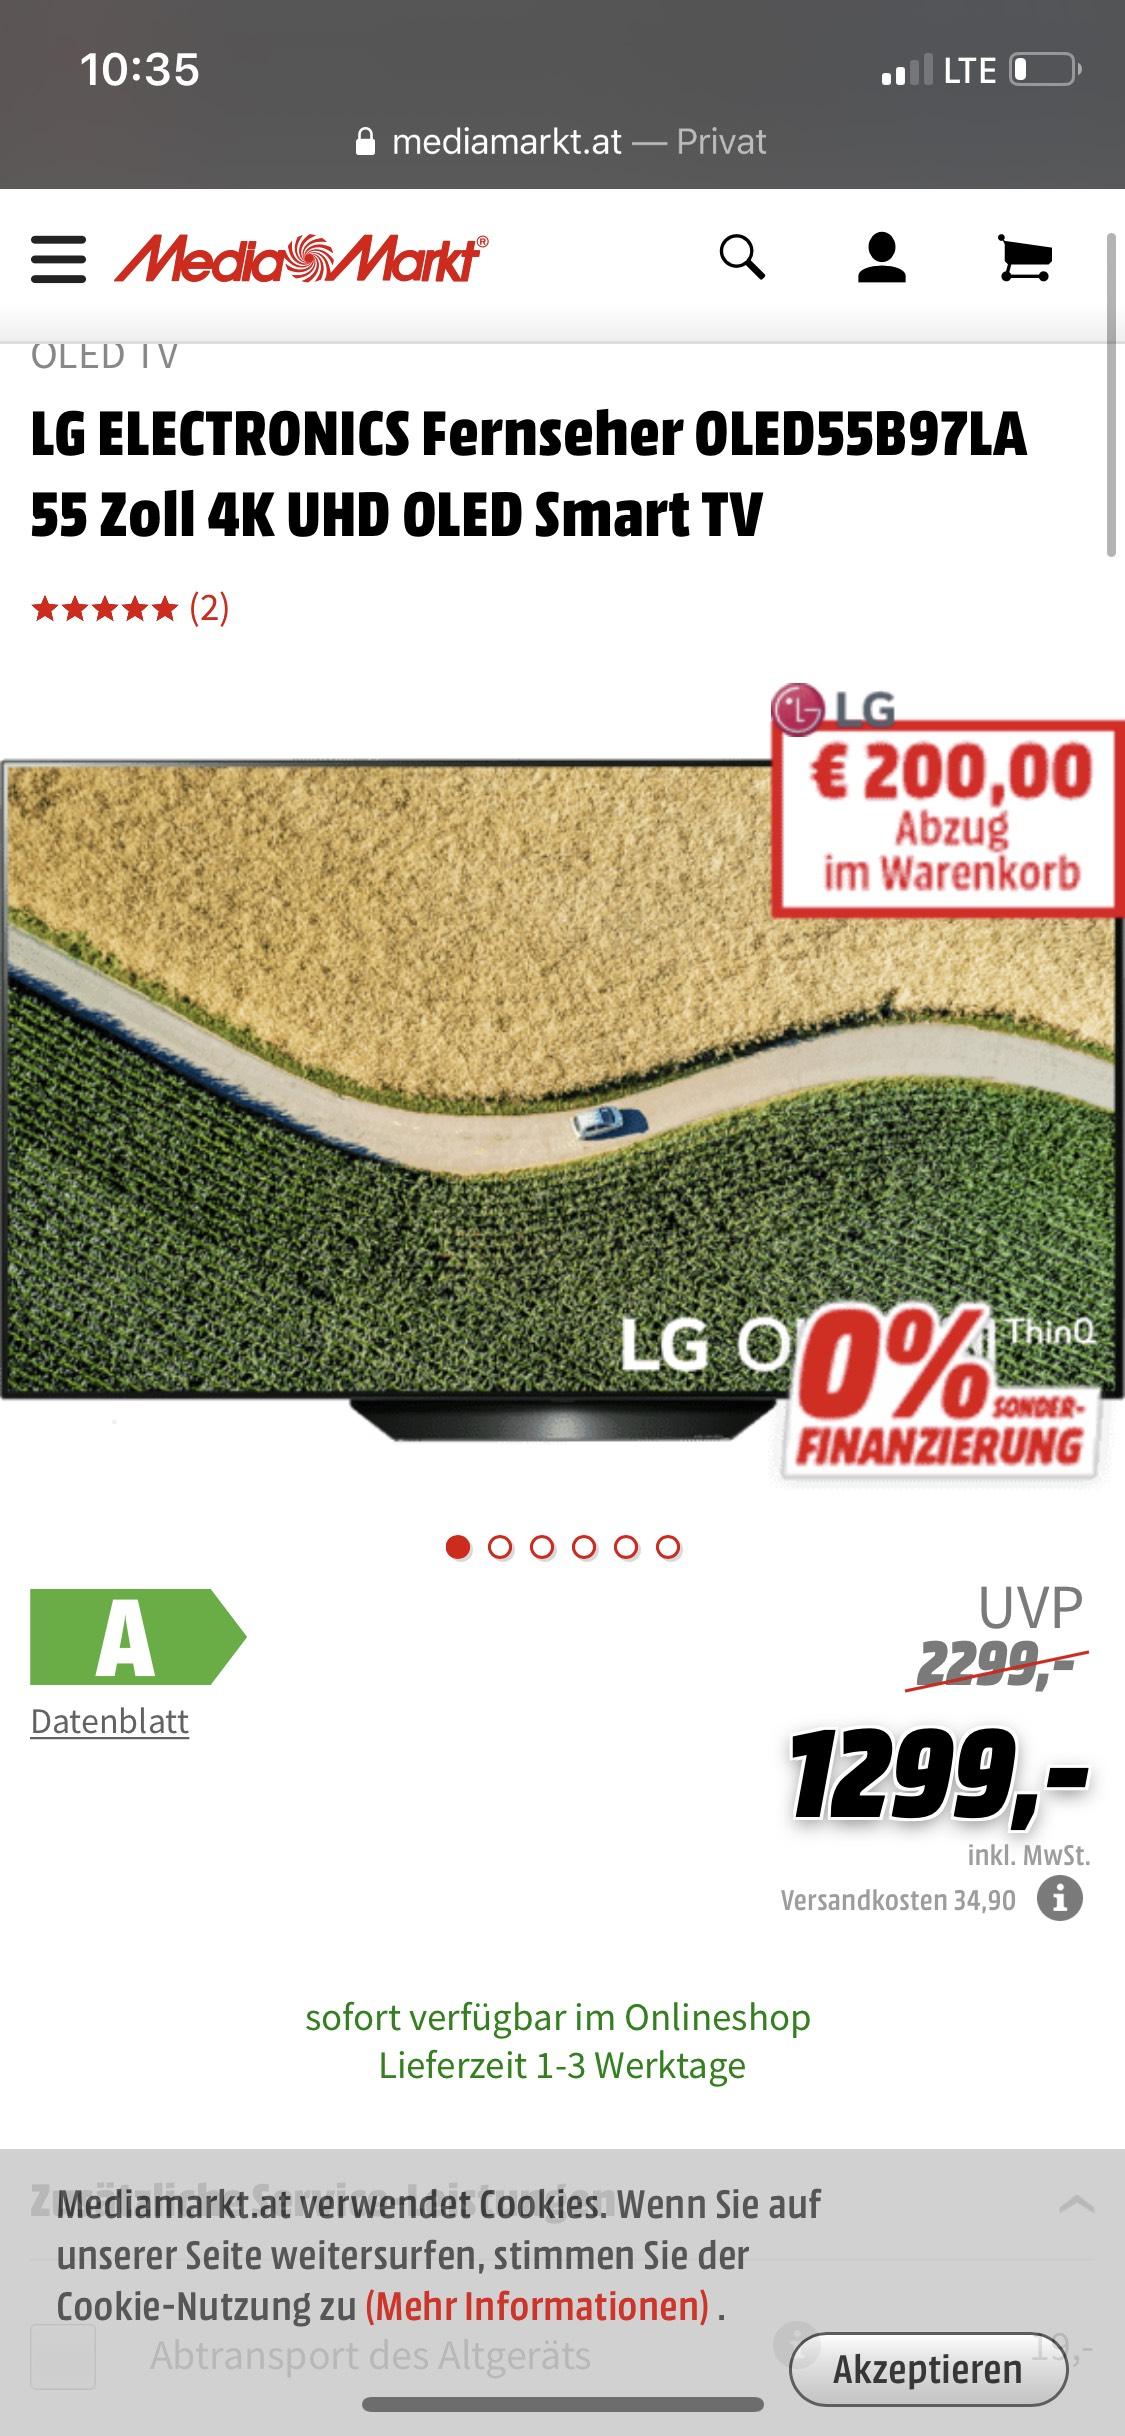 LG OLEDB97LA 55Zoll